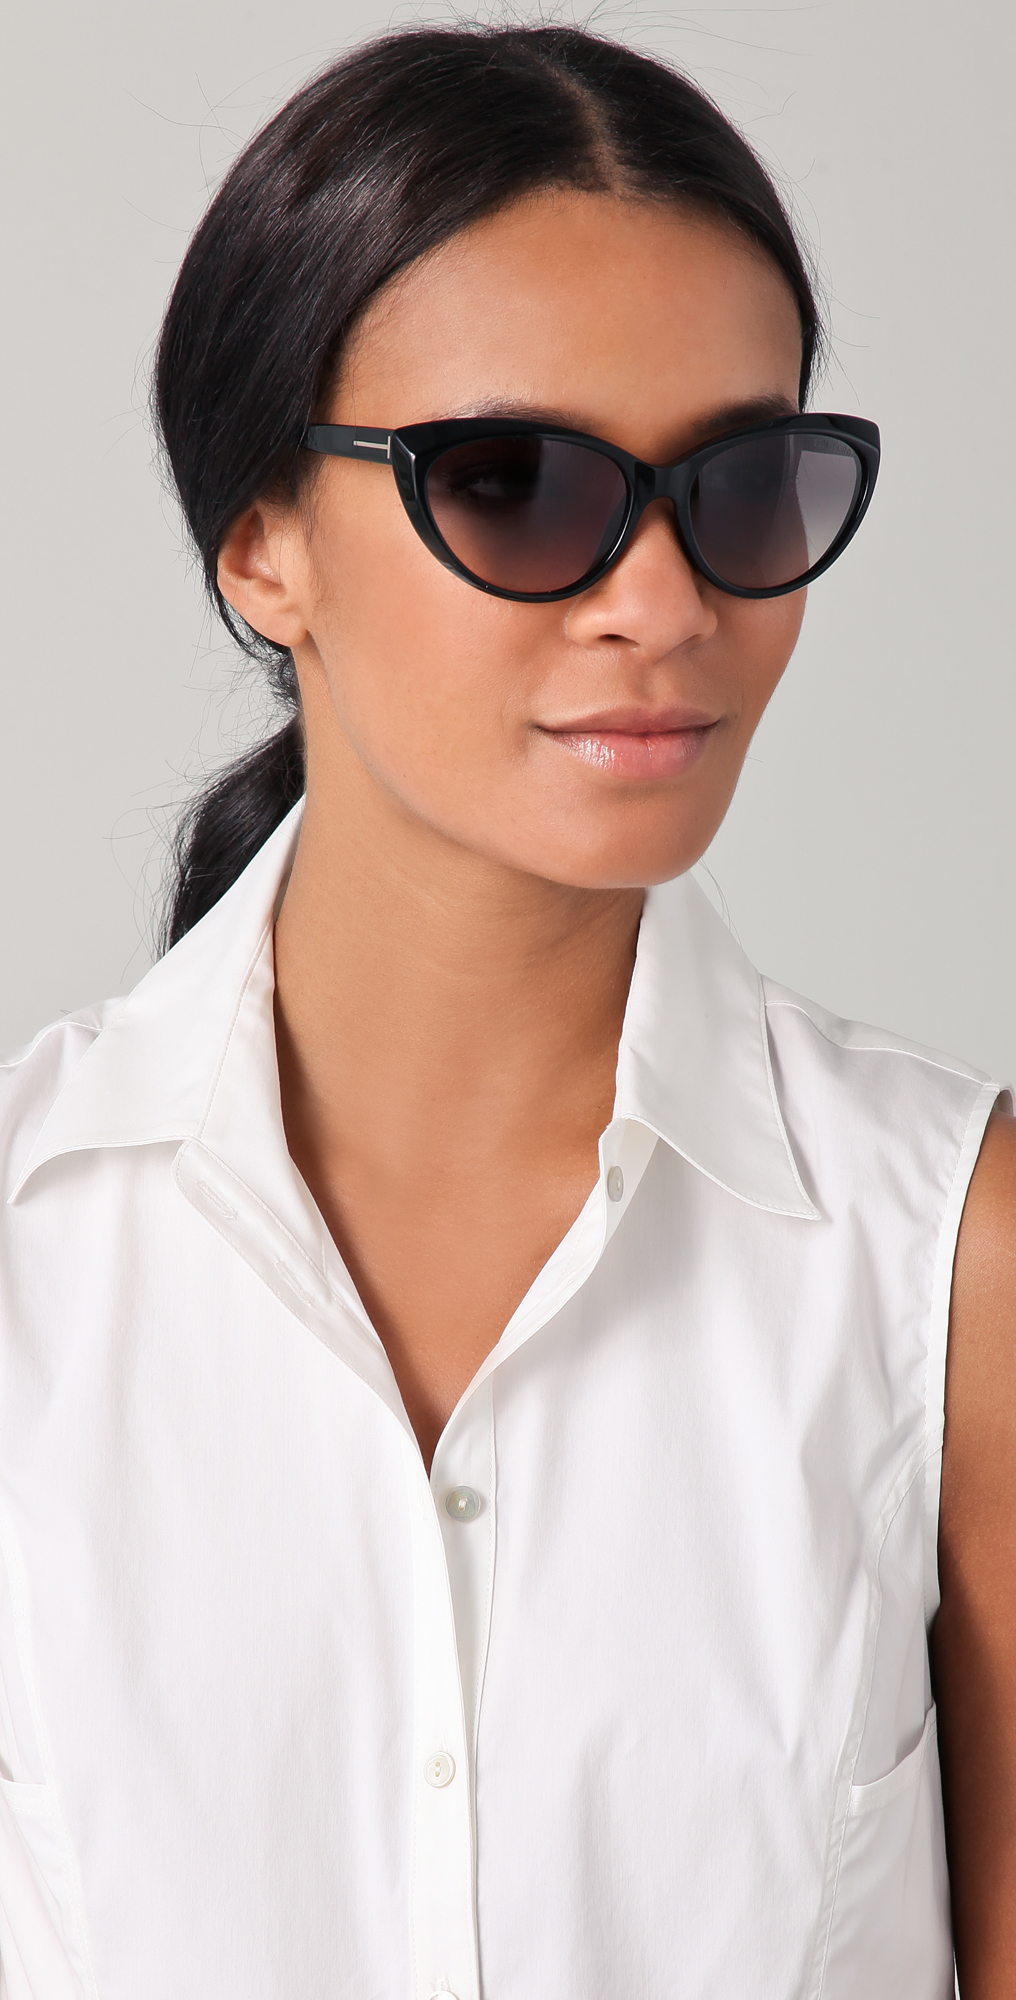 d39d01bdfa495 Tom Ford Eyewear Martina Cat Eye Sunglasses